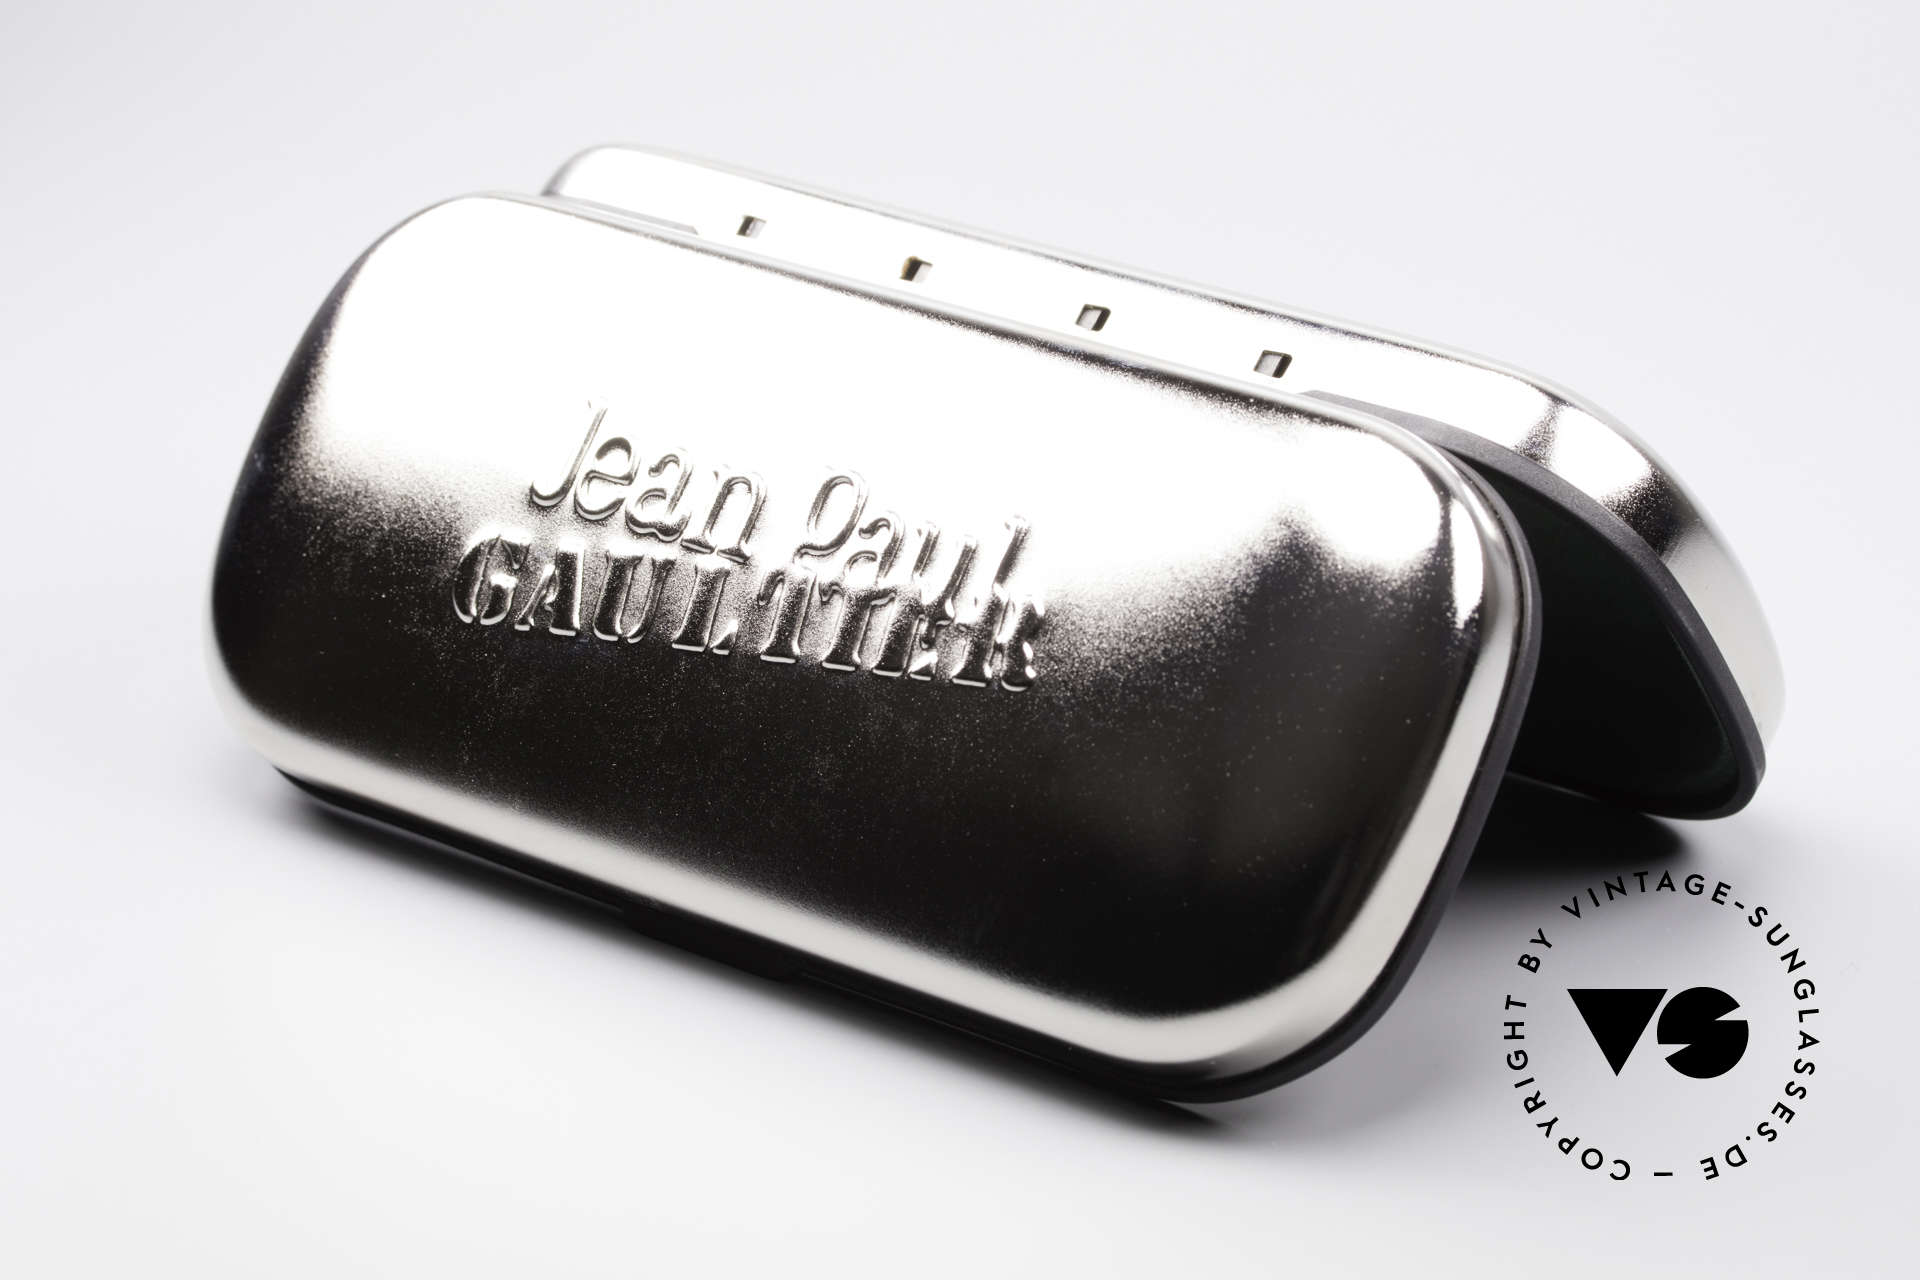 Jean Paul Gaultier 56-2177 90's Designer Sunglasses, Size: medium, Made for Men and Women